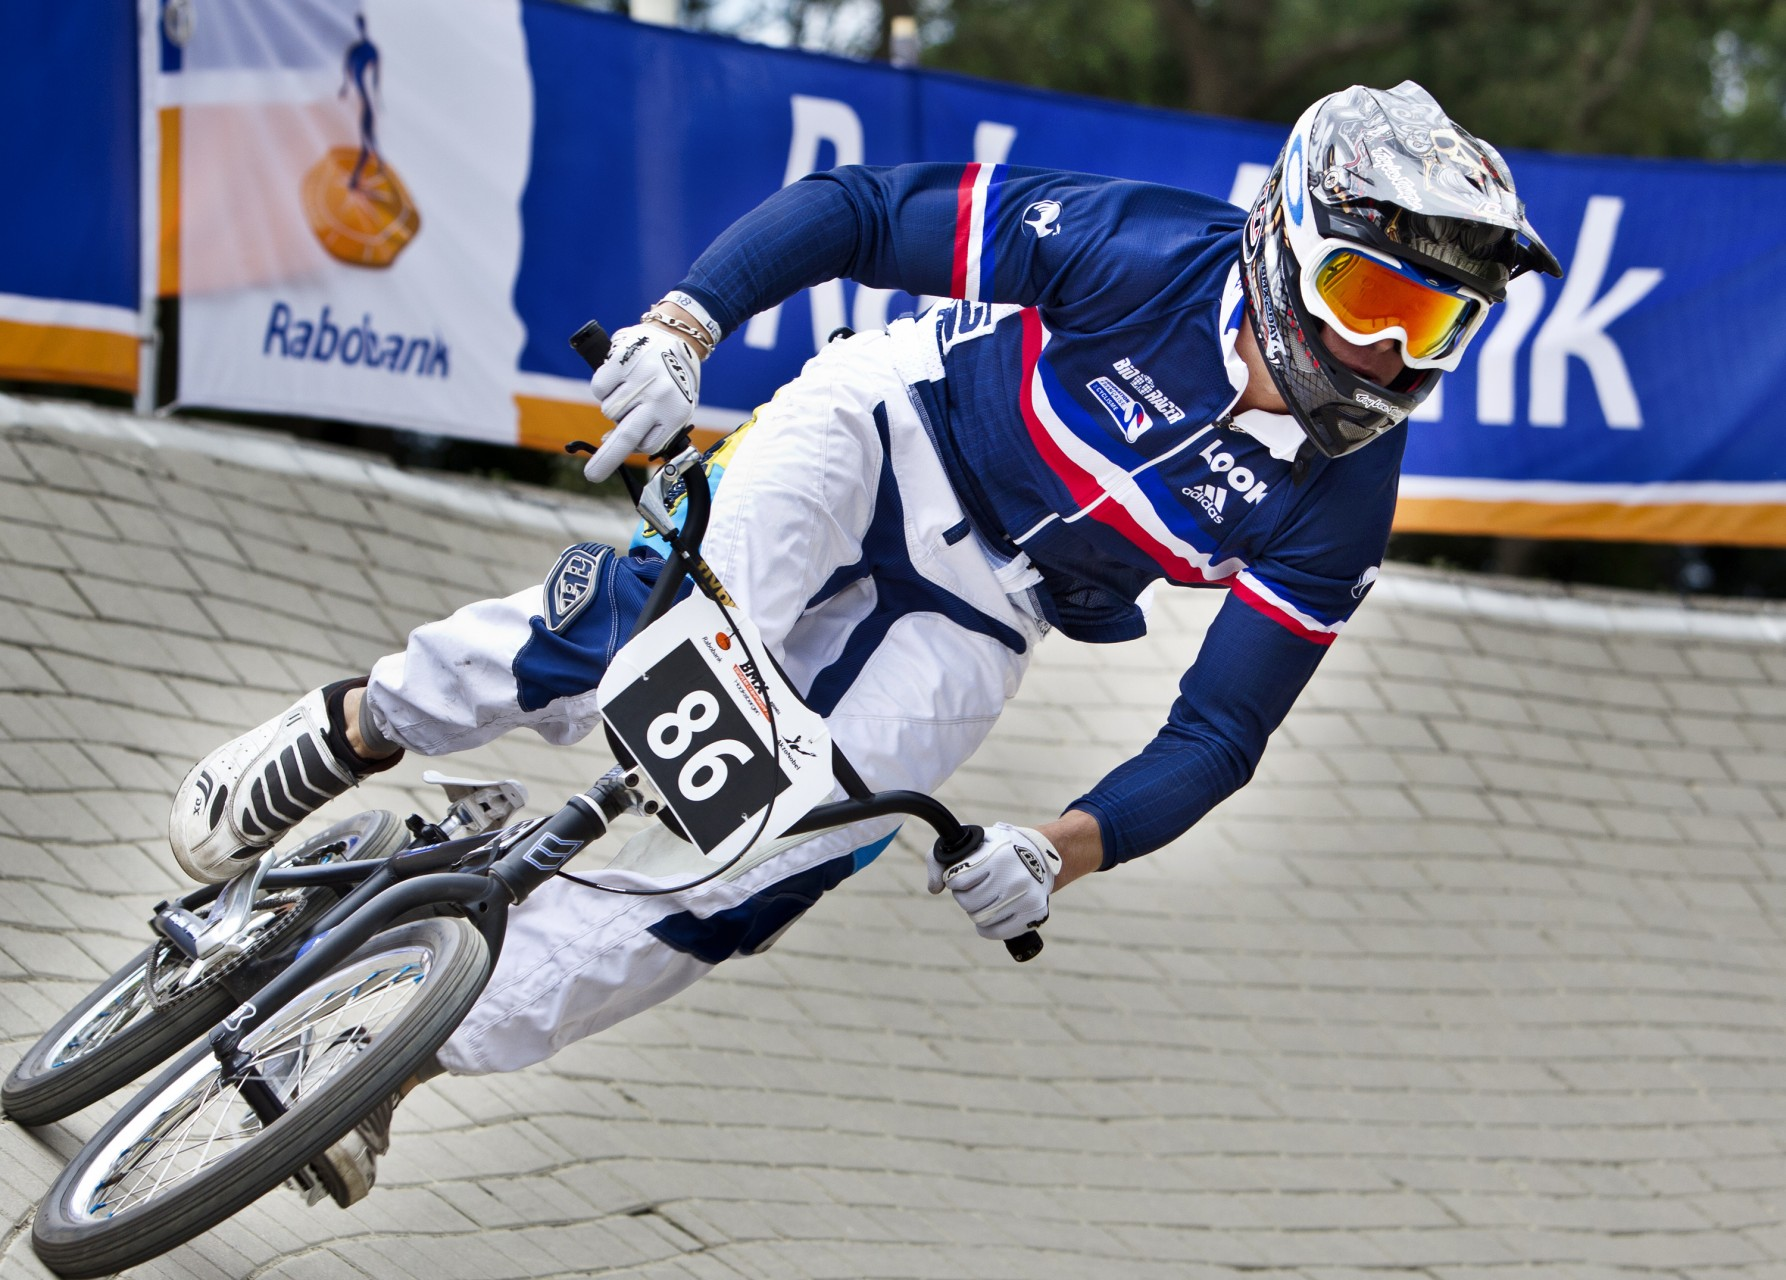 EK BMX Haaksbergen